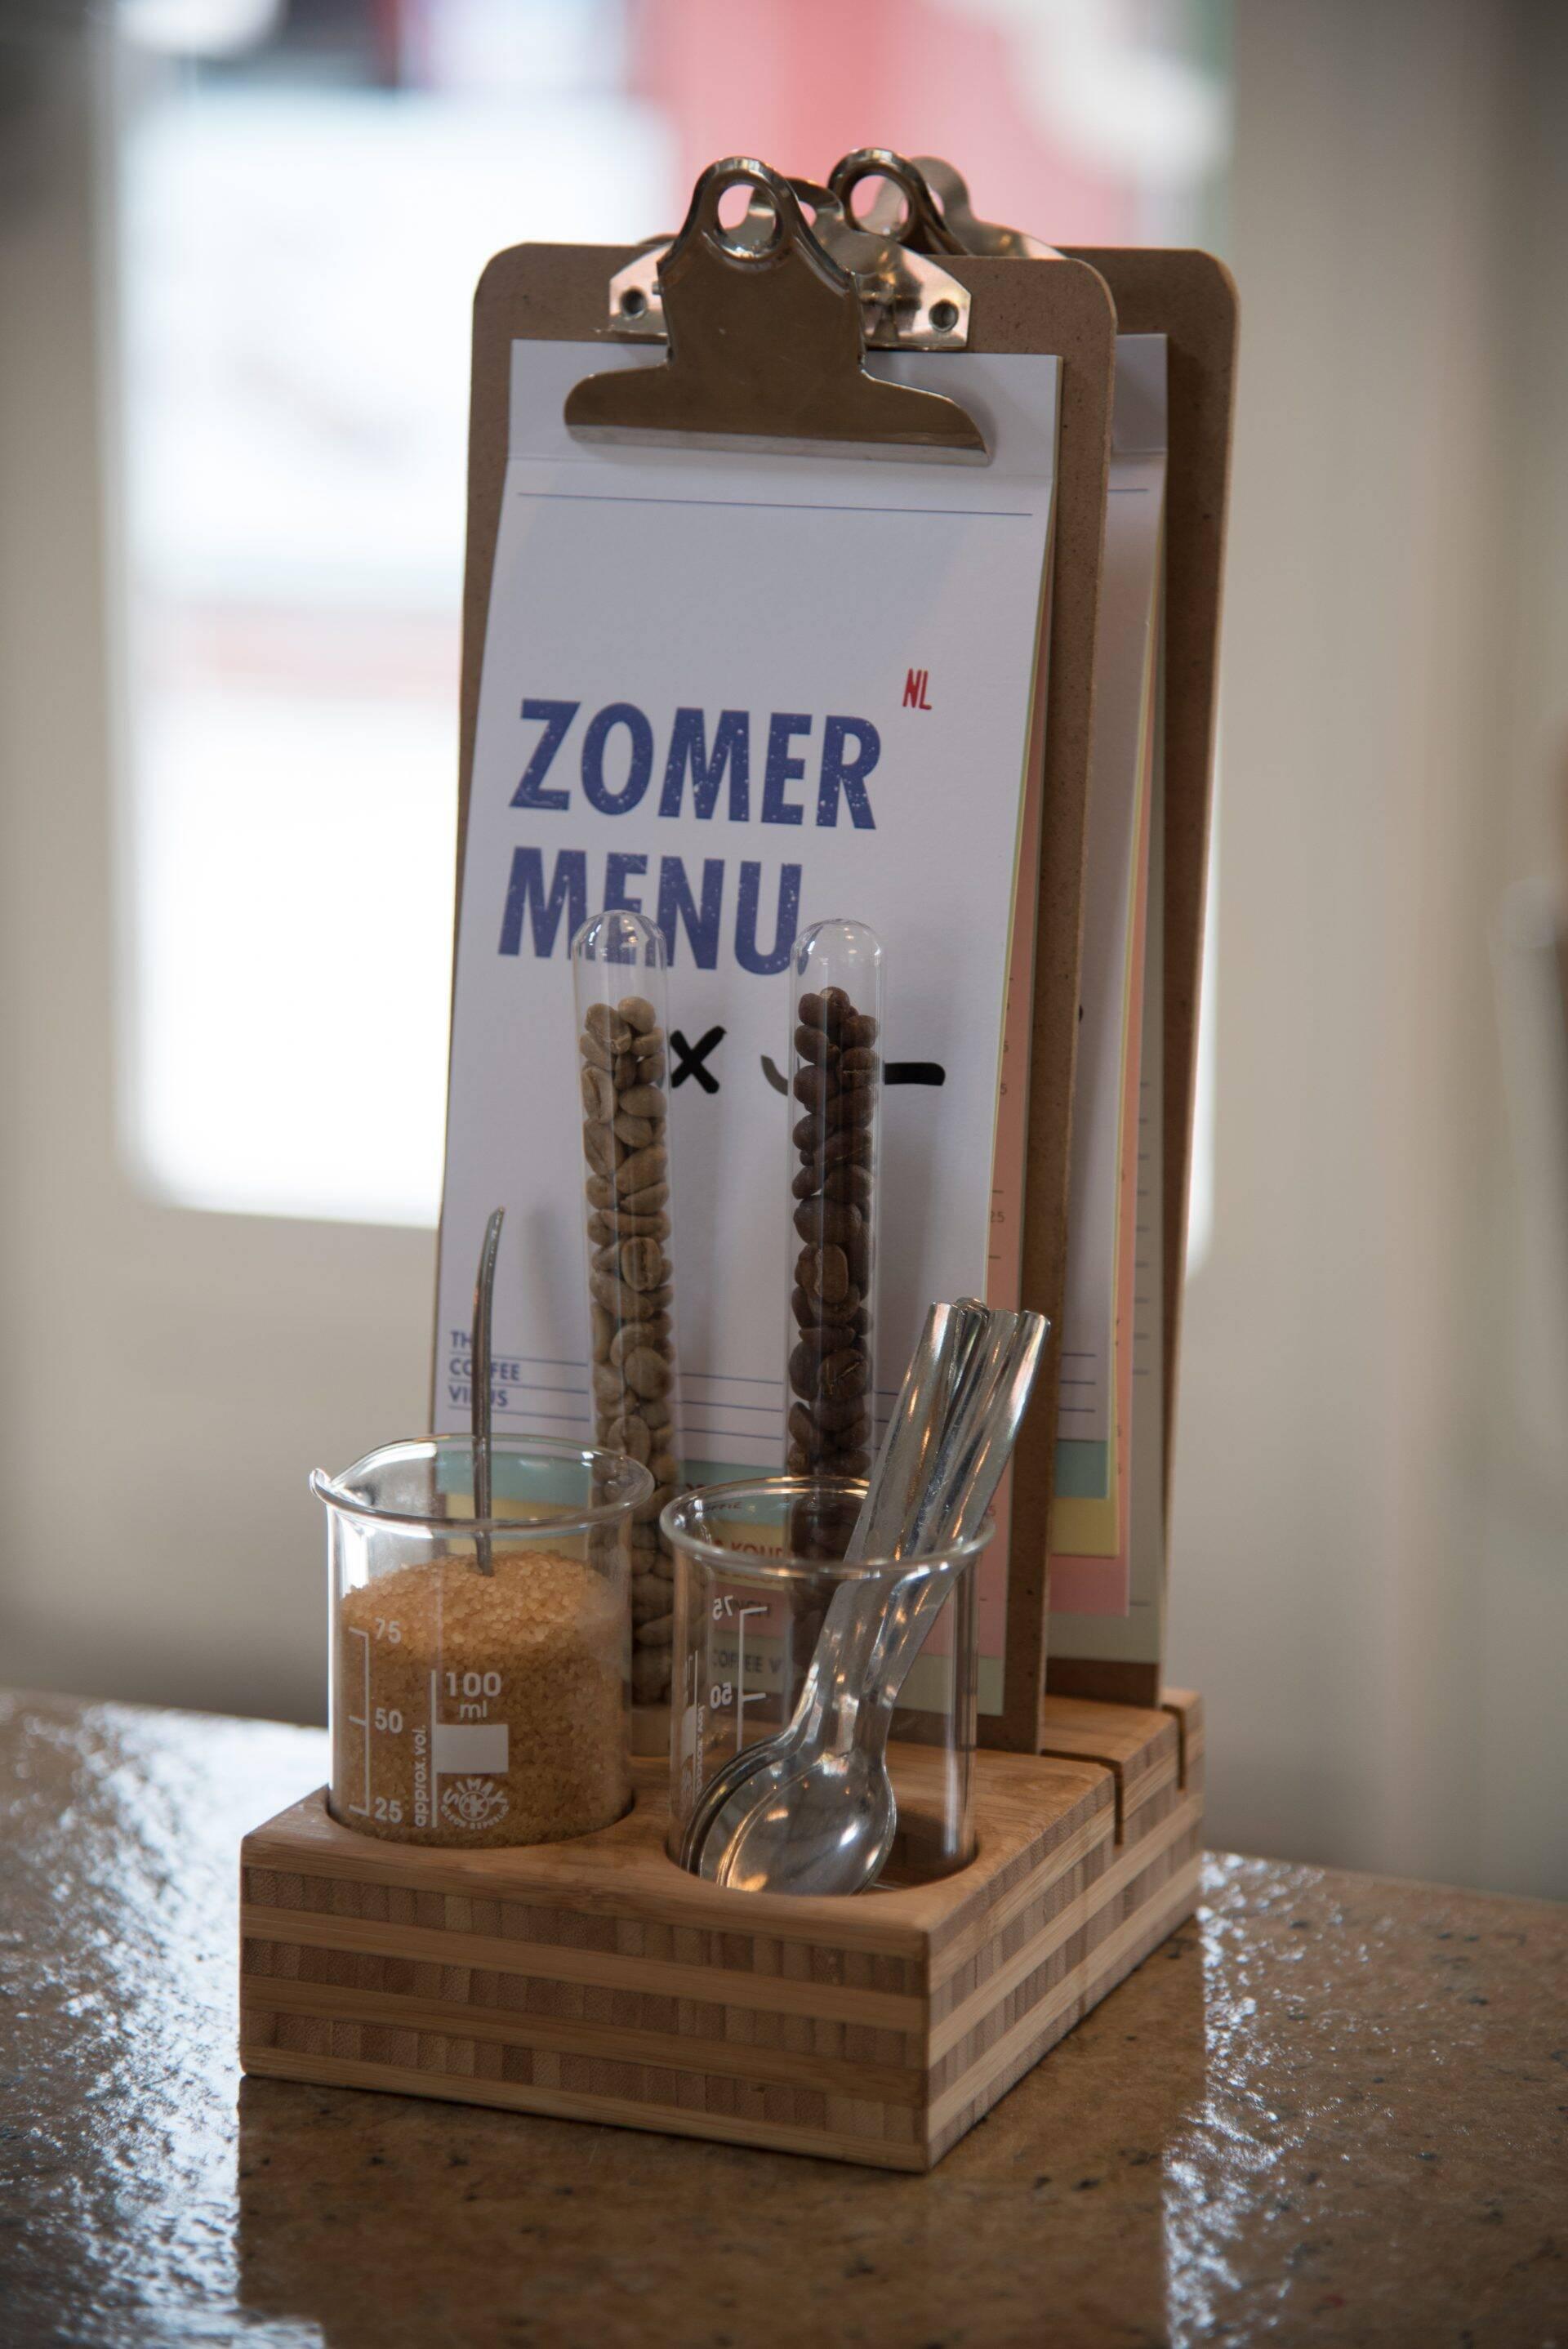 The Coffee Virus in Amsterdam